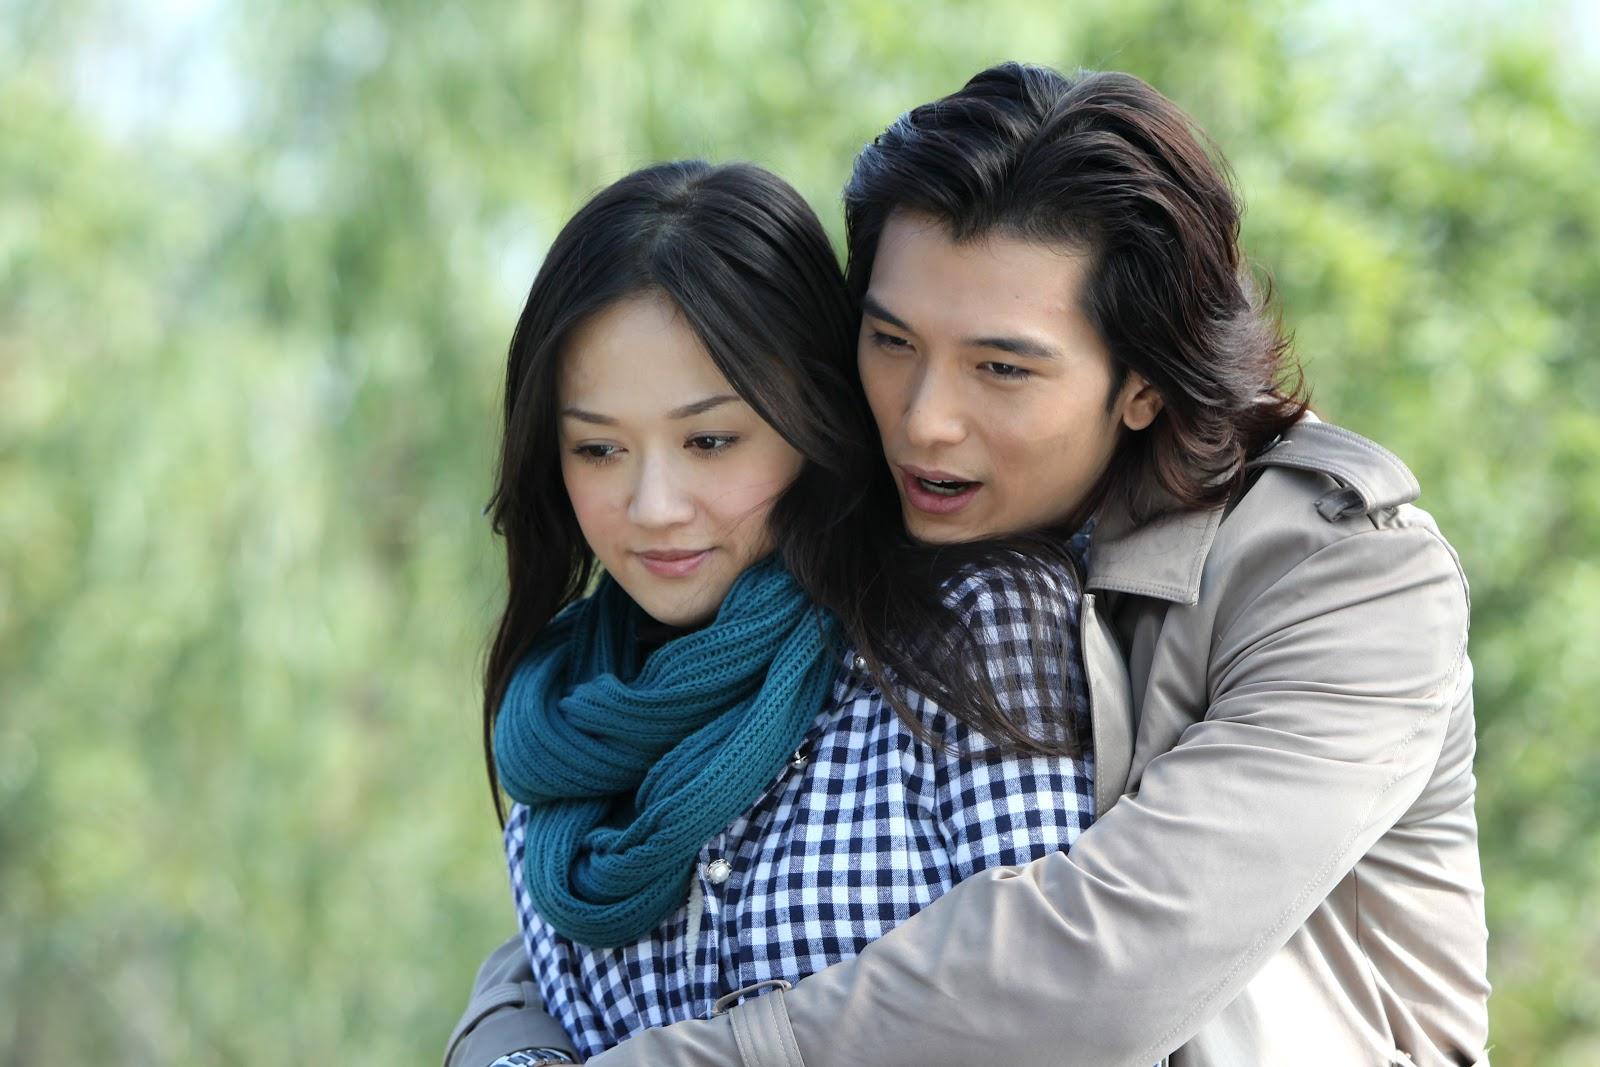 Travesuras De Amor Novelas Coreanas En Espaol Latino Online | Share ...